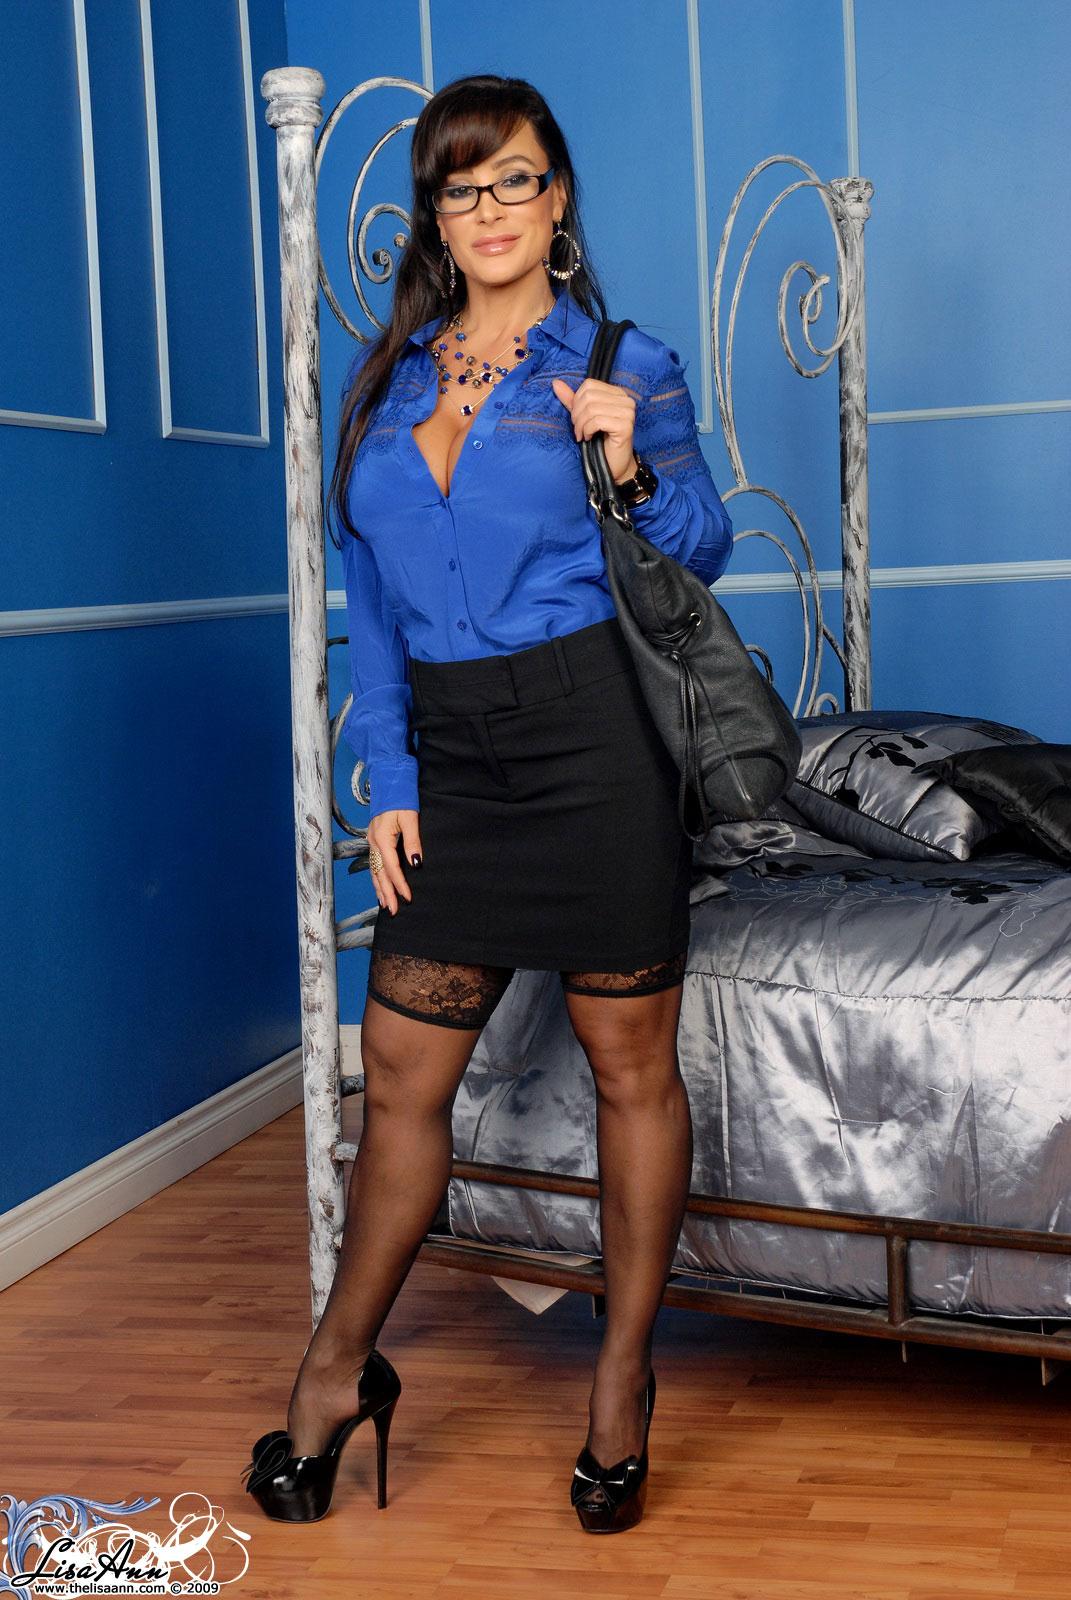 Lisa Ann Business Sex Class - Lisa Ann - The Gorgeous Pornstar-8902